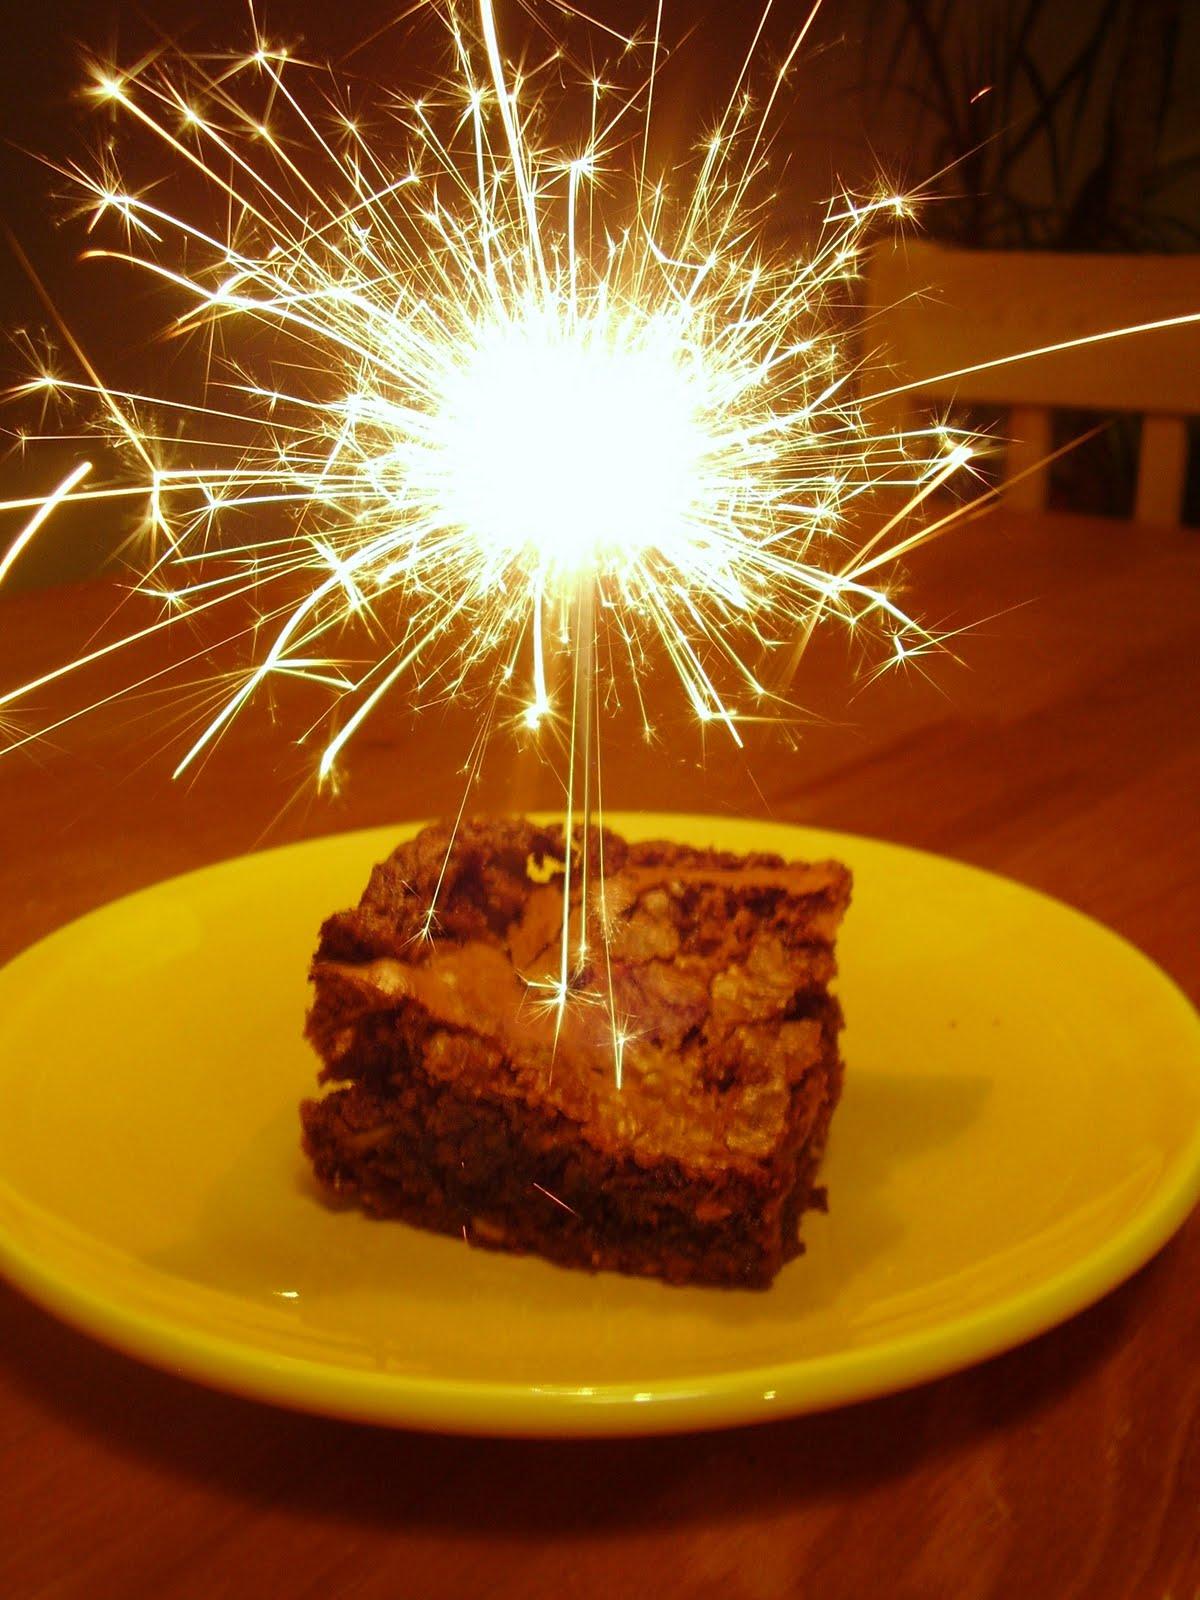 rebecca bakes cakes week 27 daim bar birthday brownies. Black Bedroom Furniture Sets. Home Design Ideas